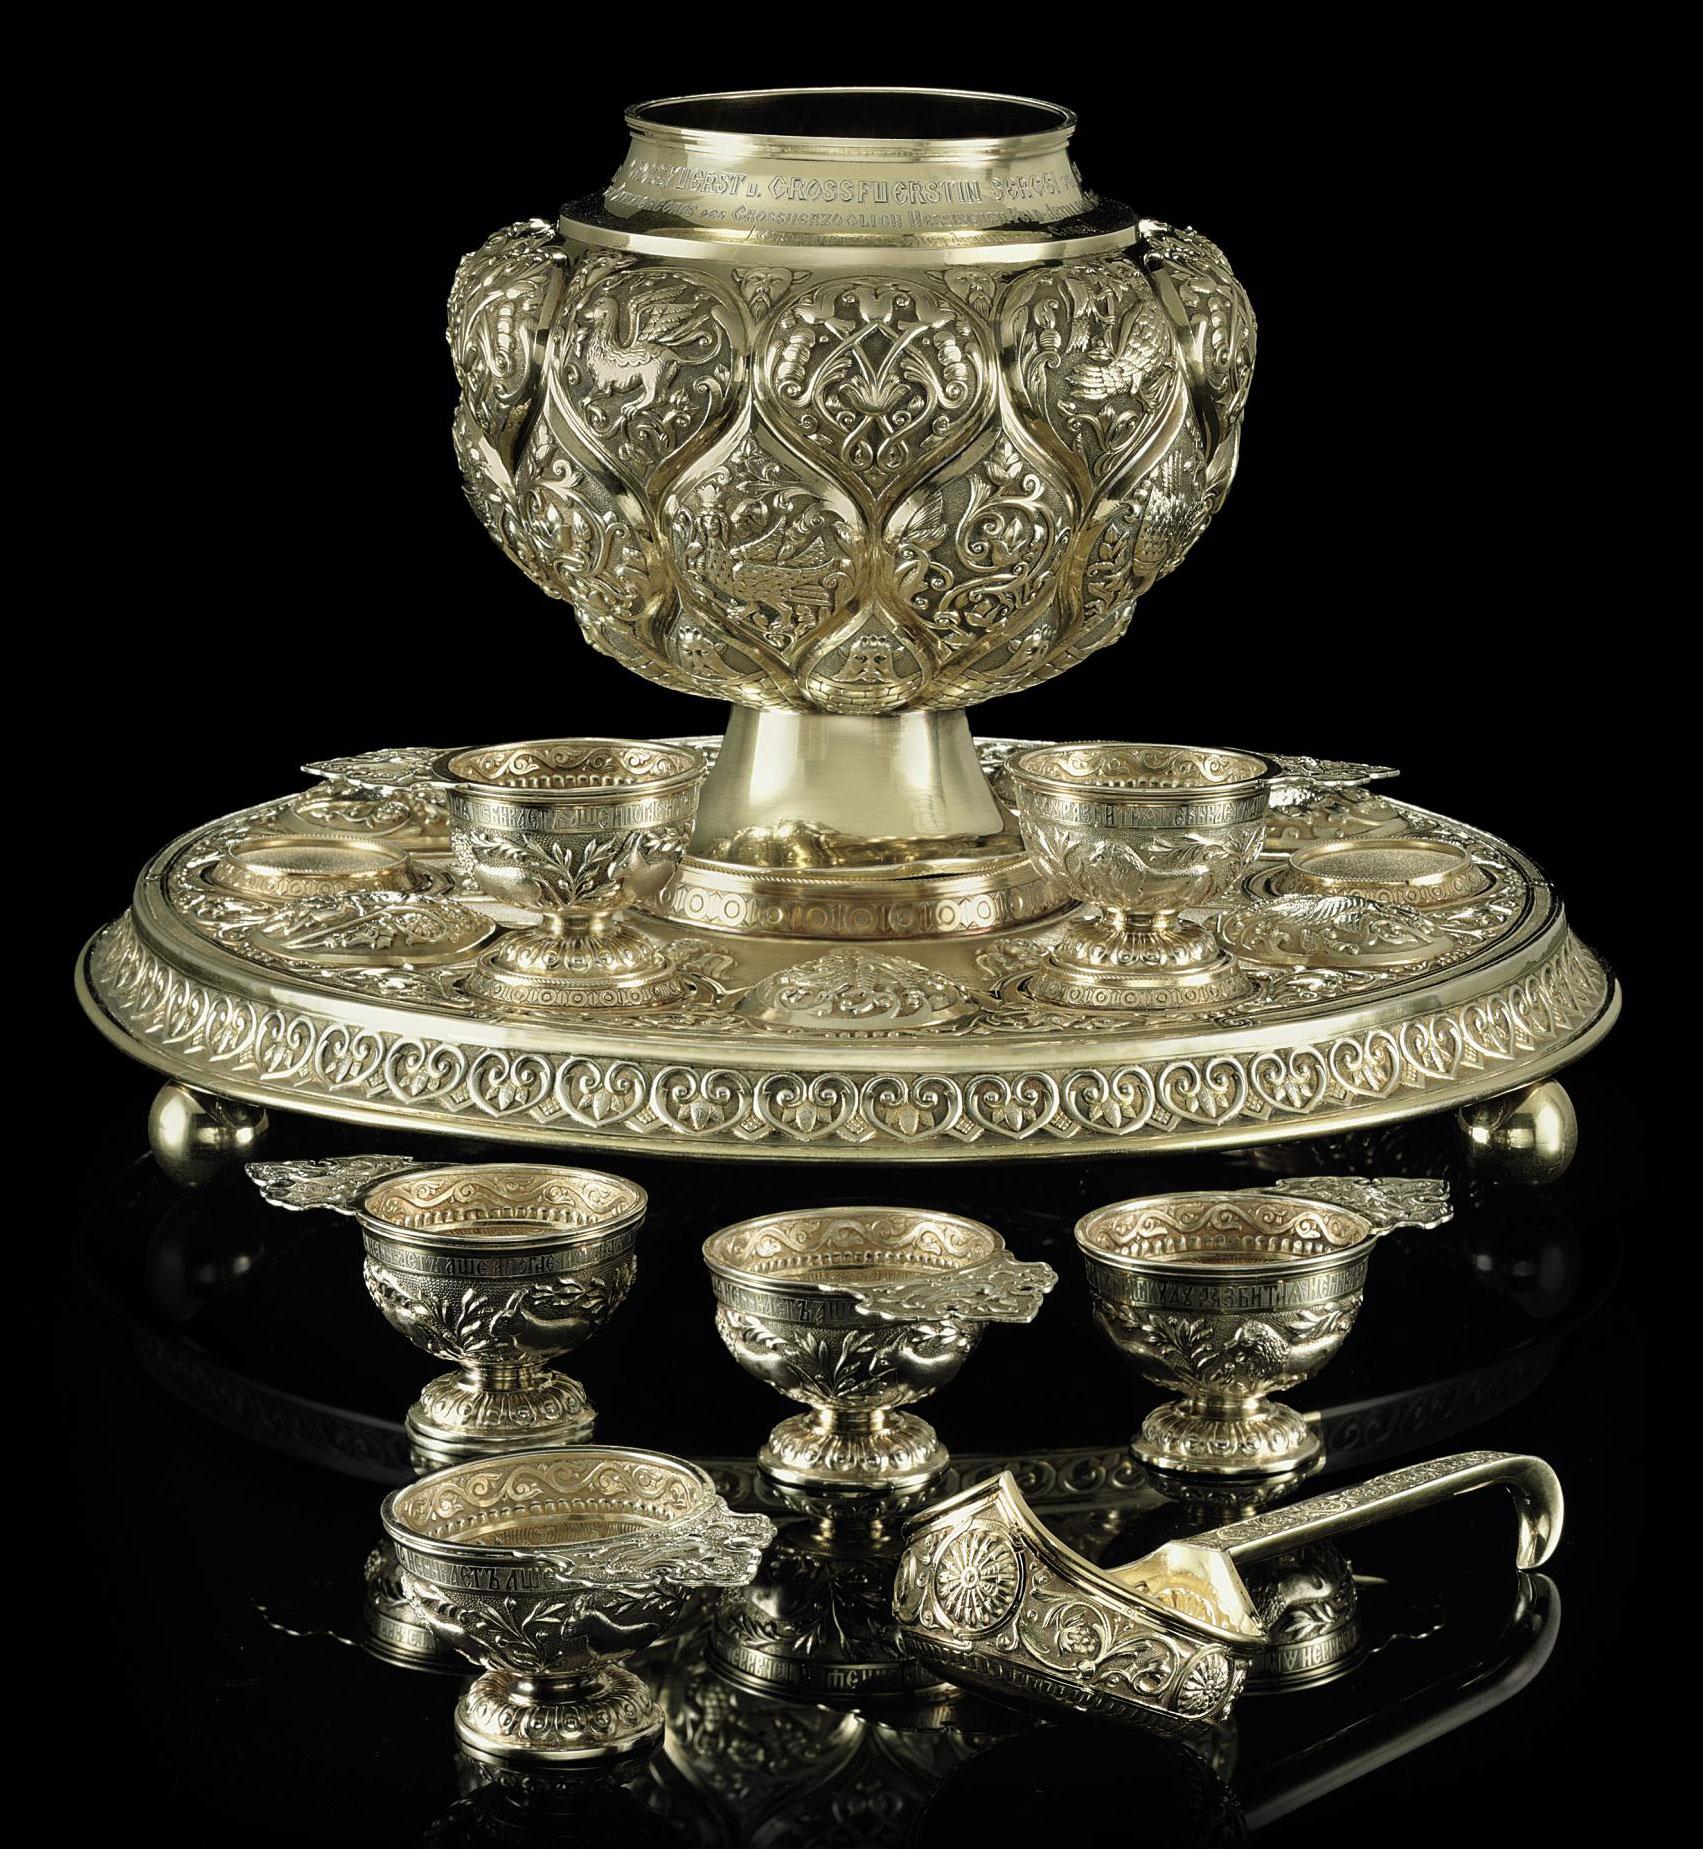 A Silver-Gilt Punch Set